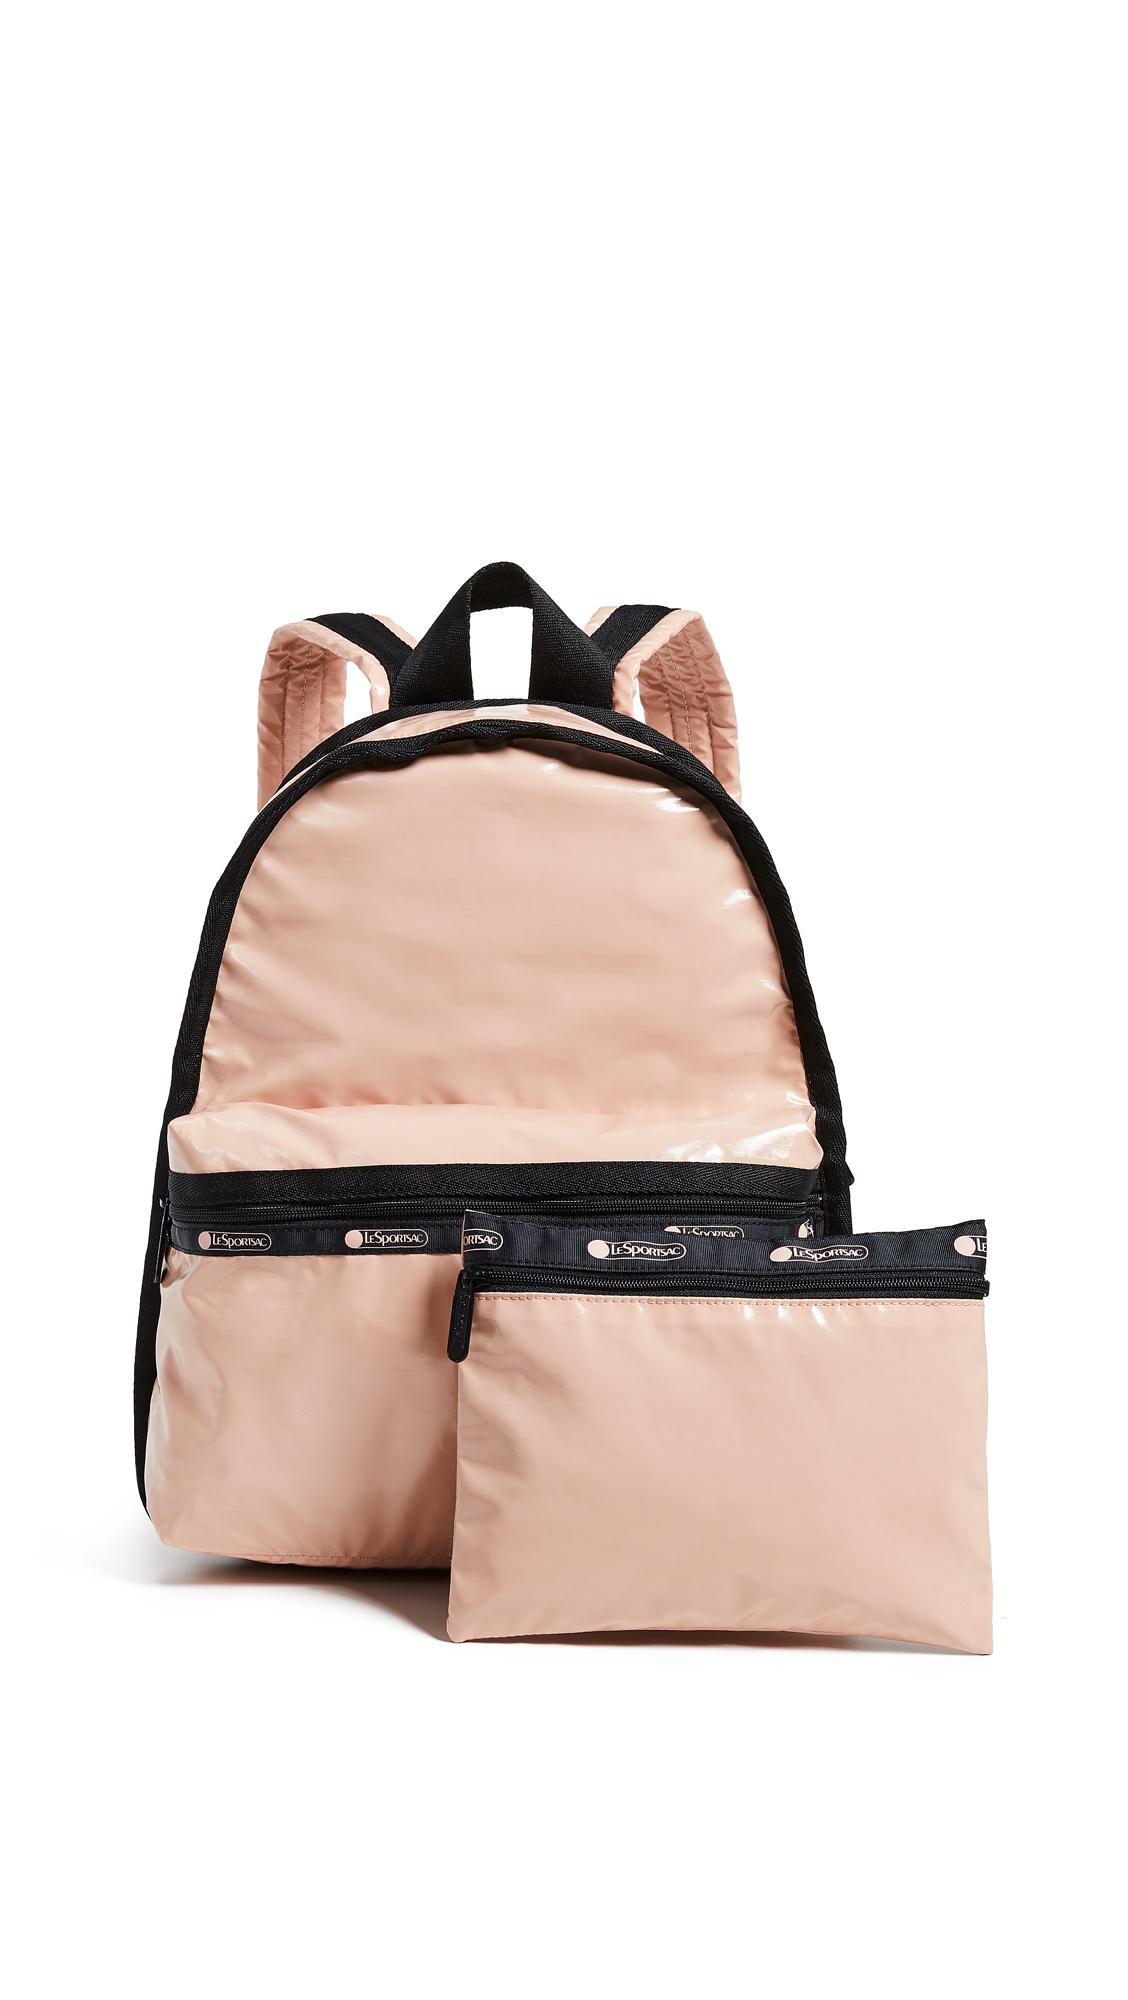 LESPORTSAC Candace Backpack in English Rose